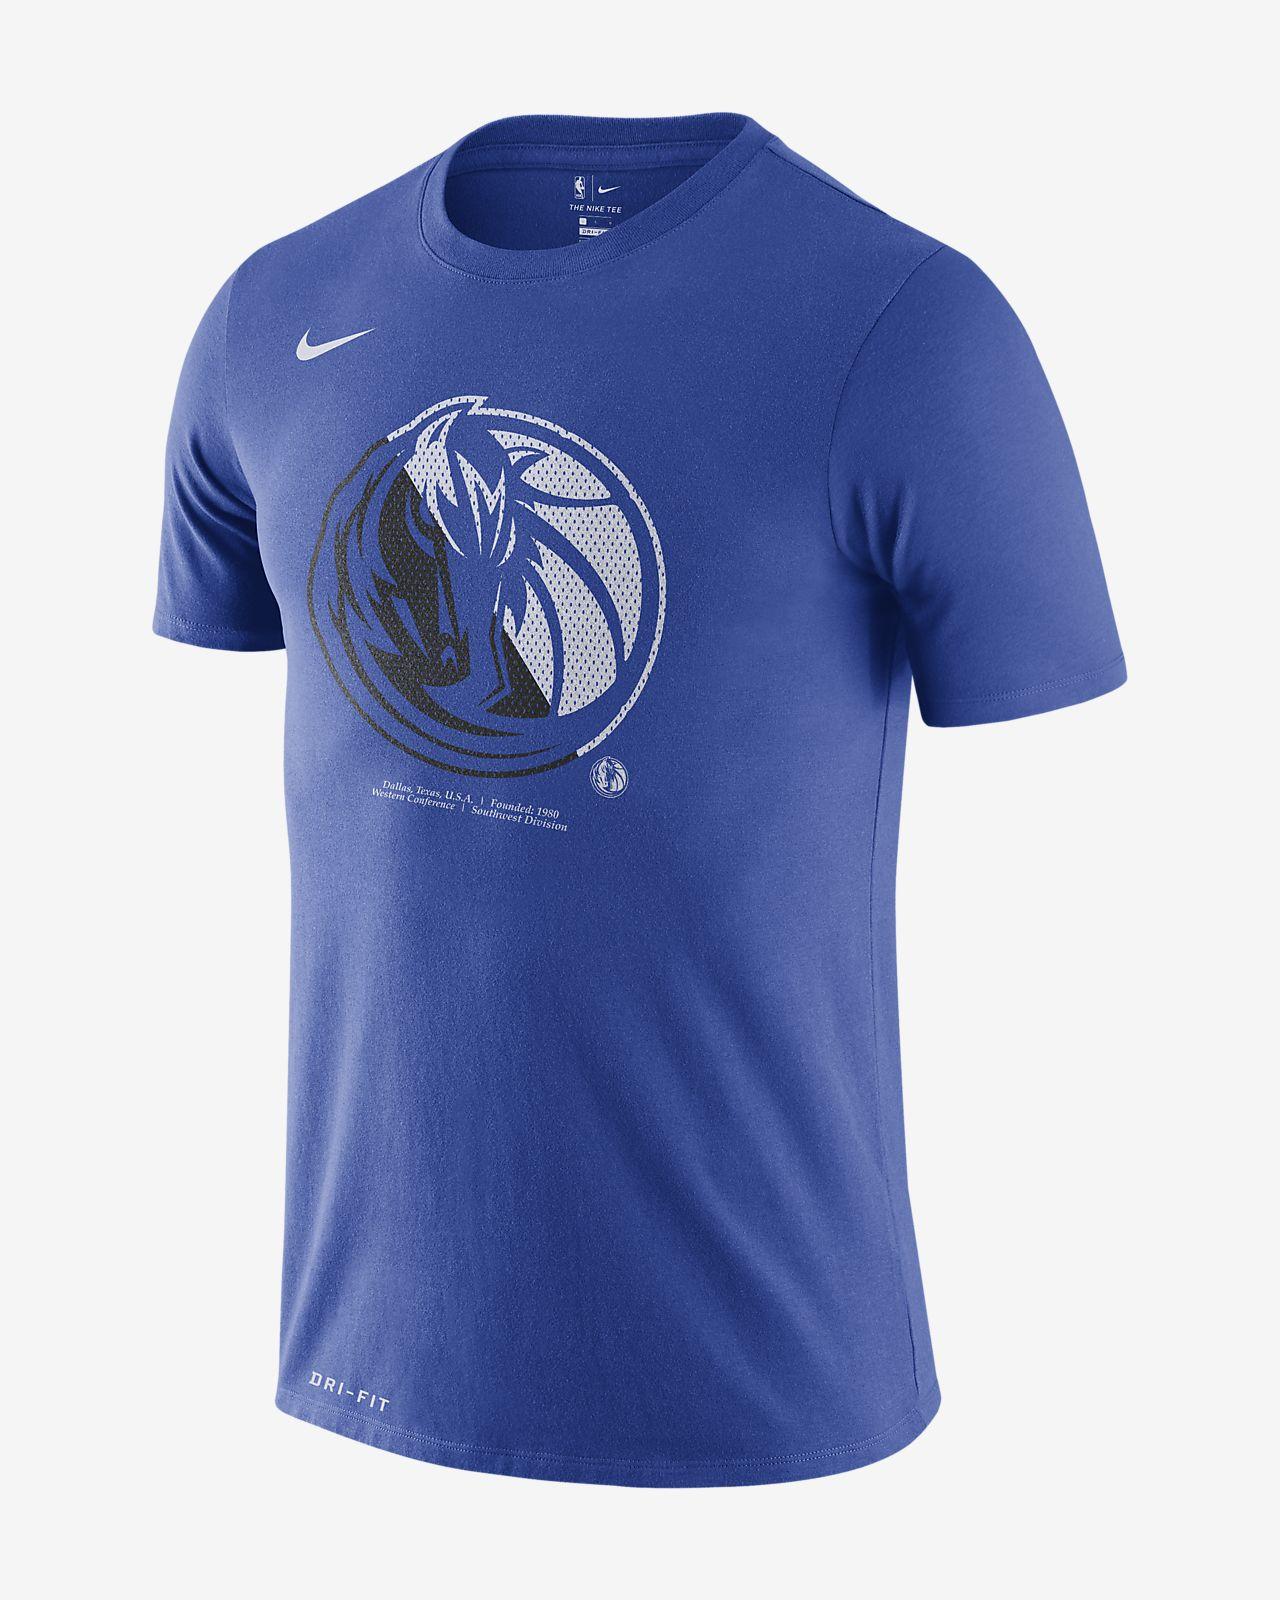 Dallas Mavericks Nike Dri-FIT NBA-herenshirt